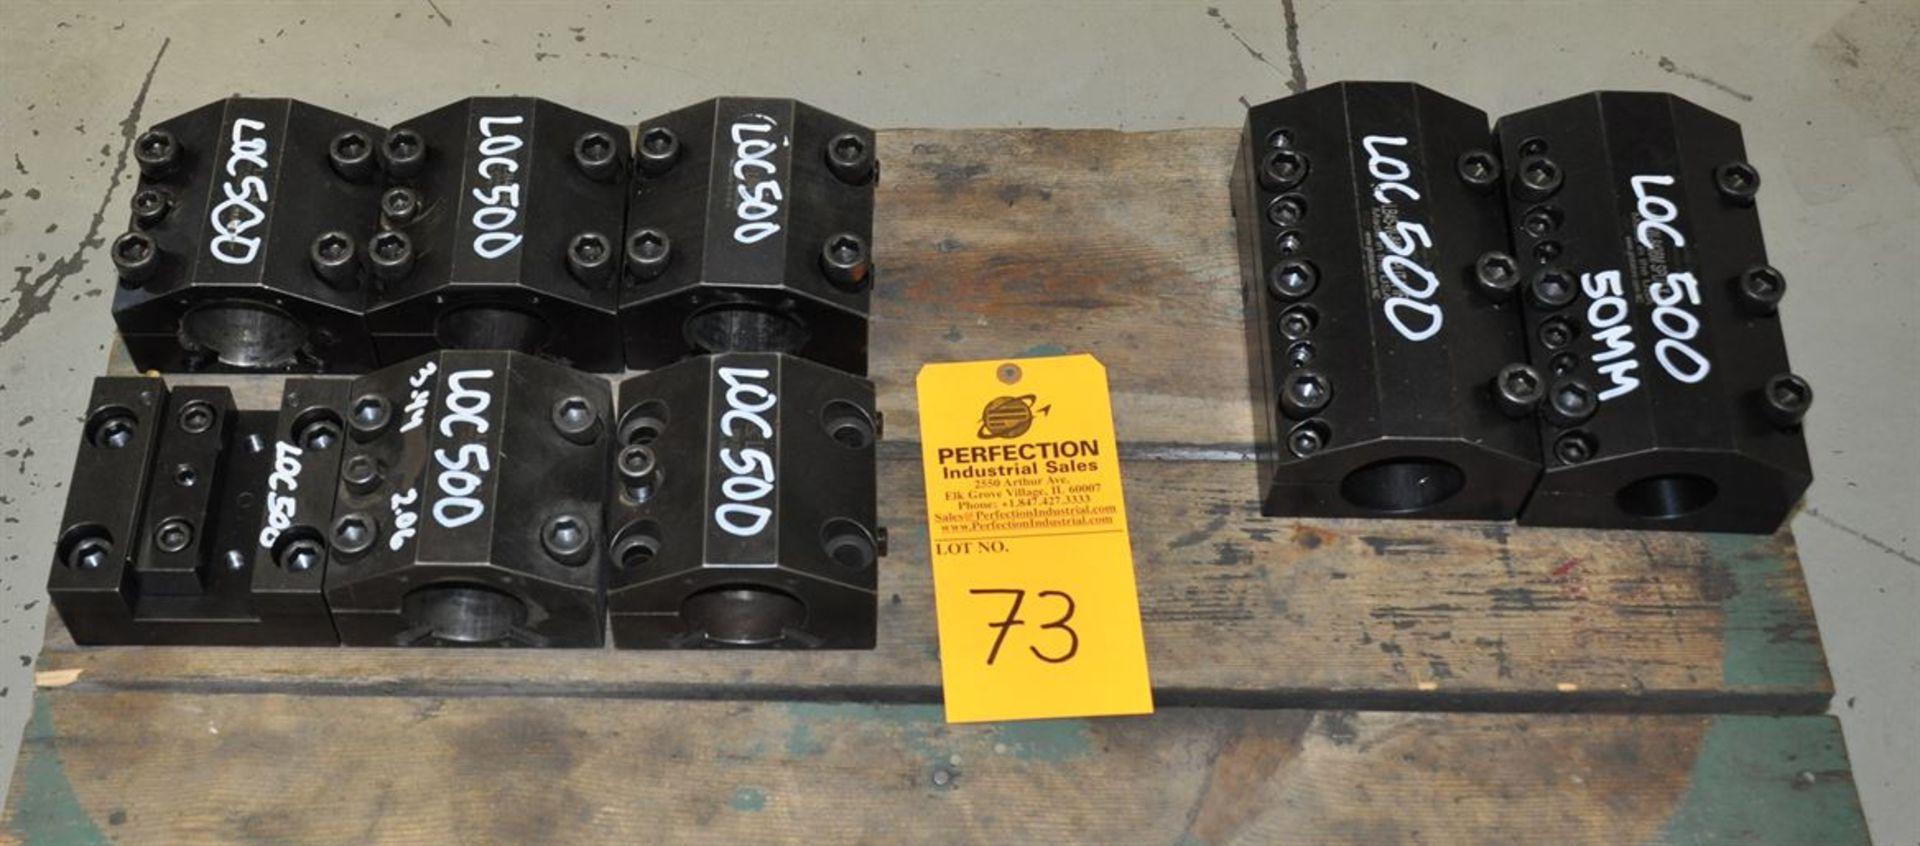 "LOC 500 2.5"" boring bar holders, (2) 50mm boring bar holder & (6) 1.25"" face plunge stick tool"